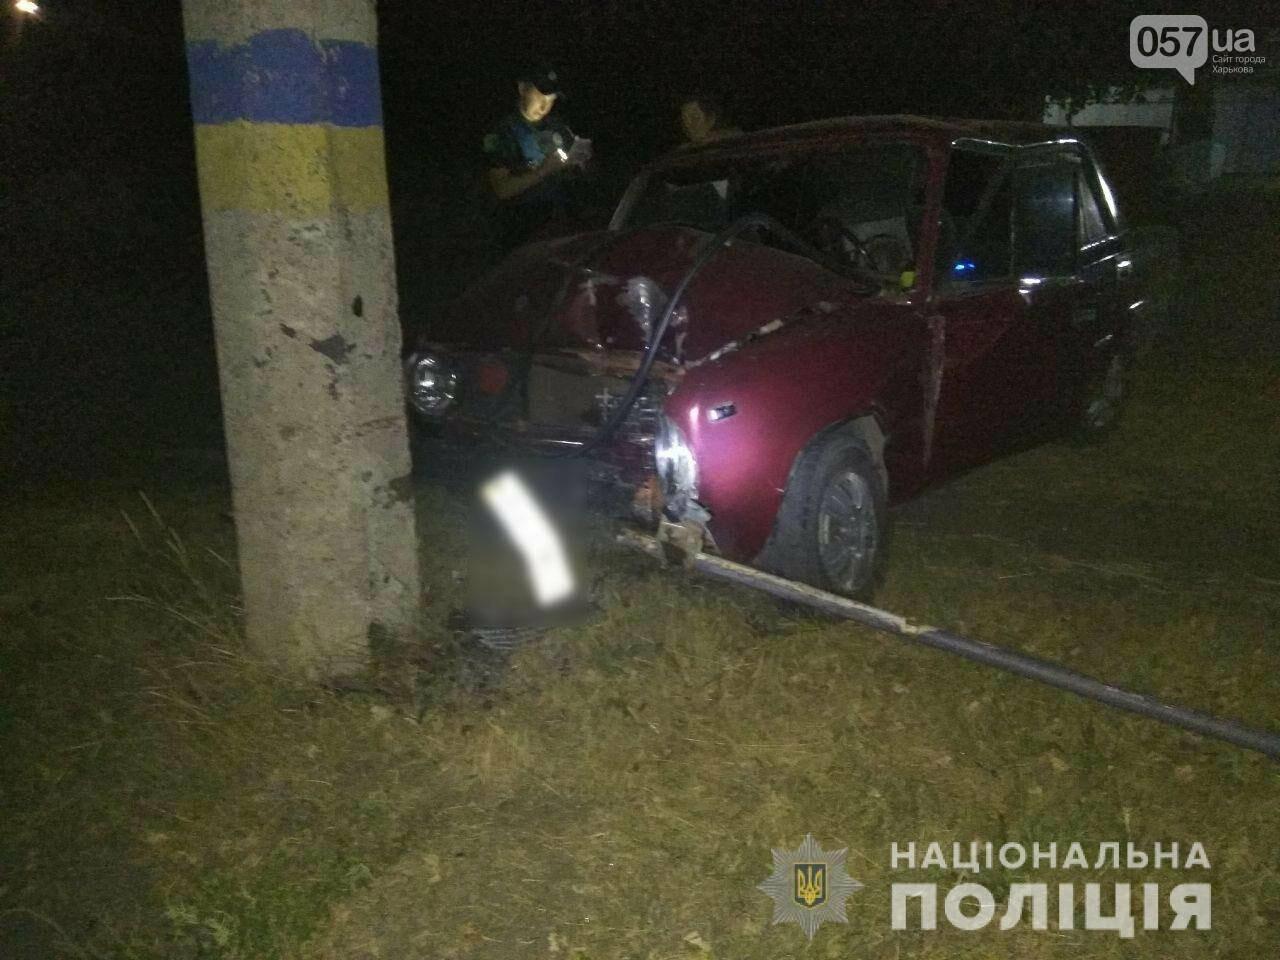 Харьковчанин за рулем «ВАЗ» влетел в электрический столб и умер,- ФОТО, фото-1